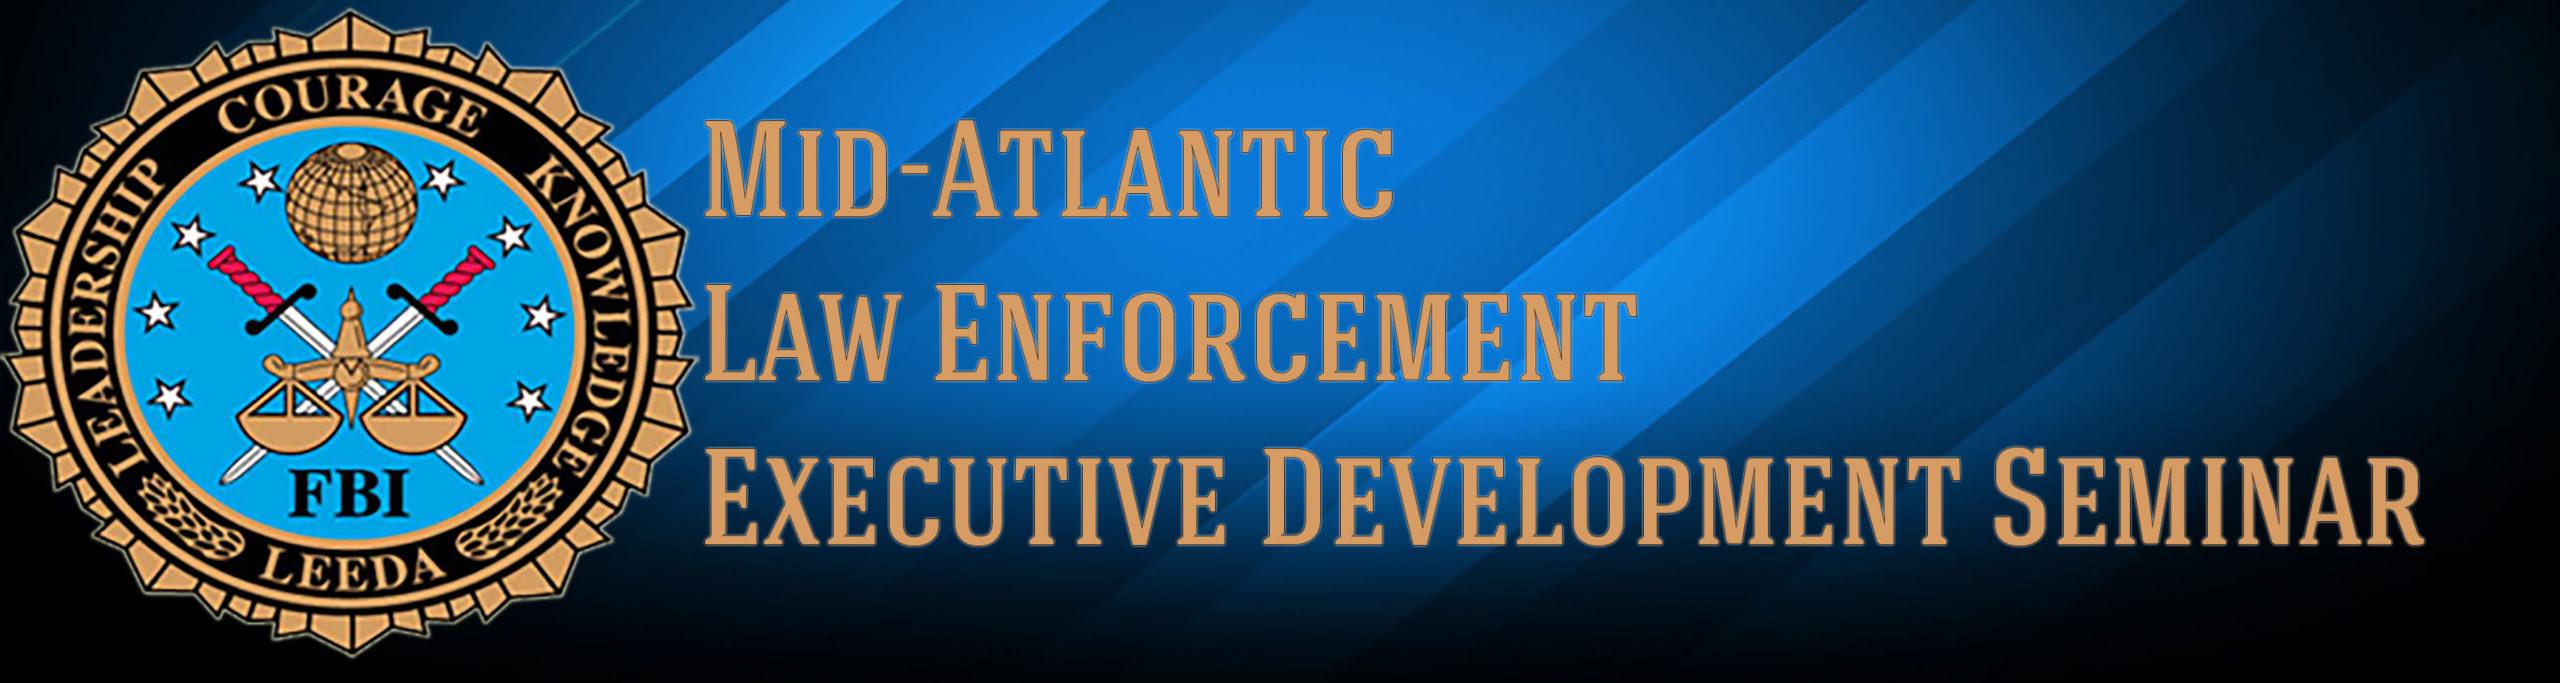 Mid-Atlantic Law Enforcement Executive Development Seminar